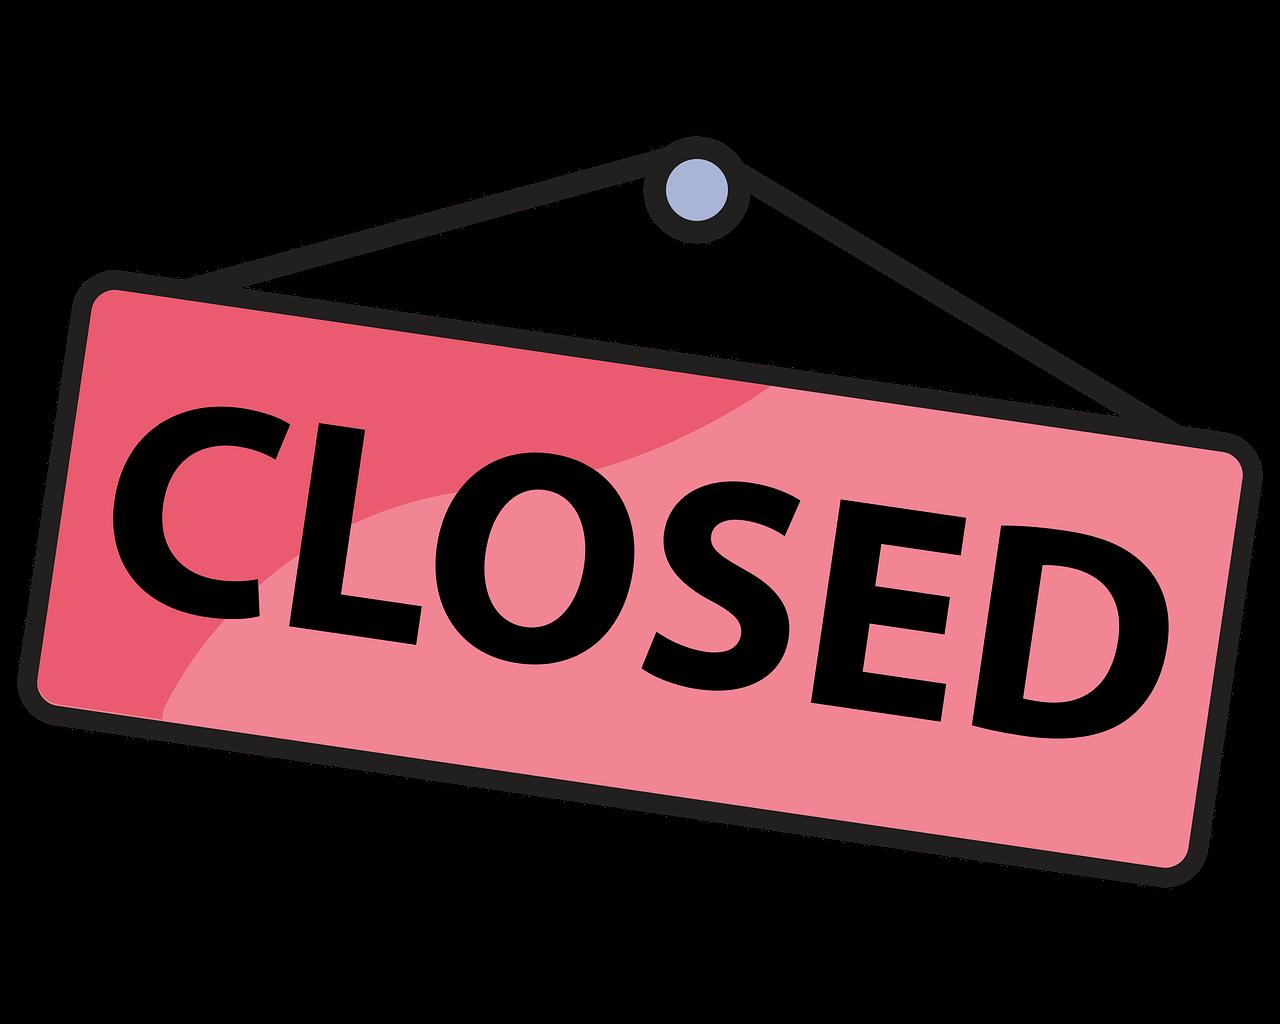 Closed Close Board - Free image on Pixabay